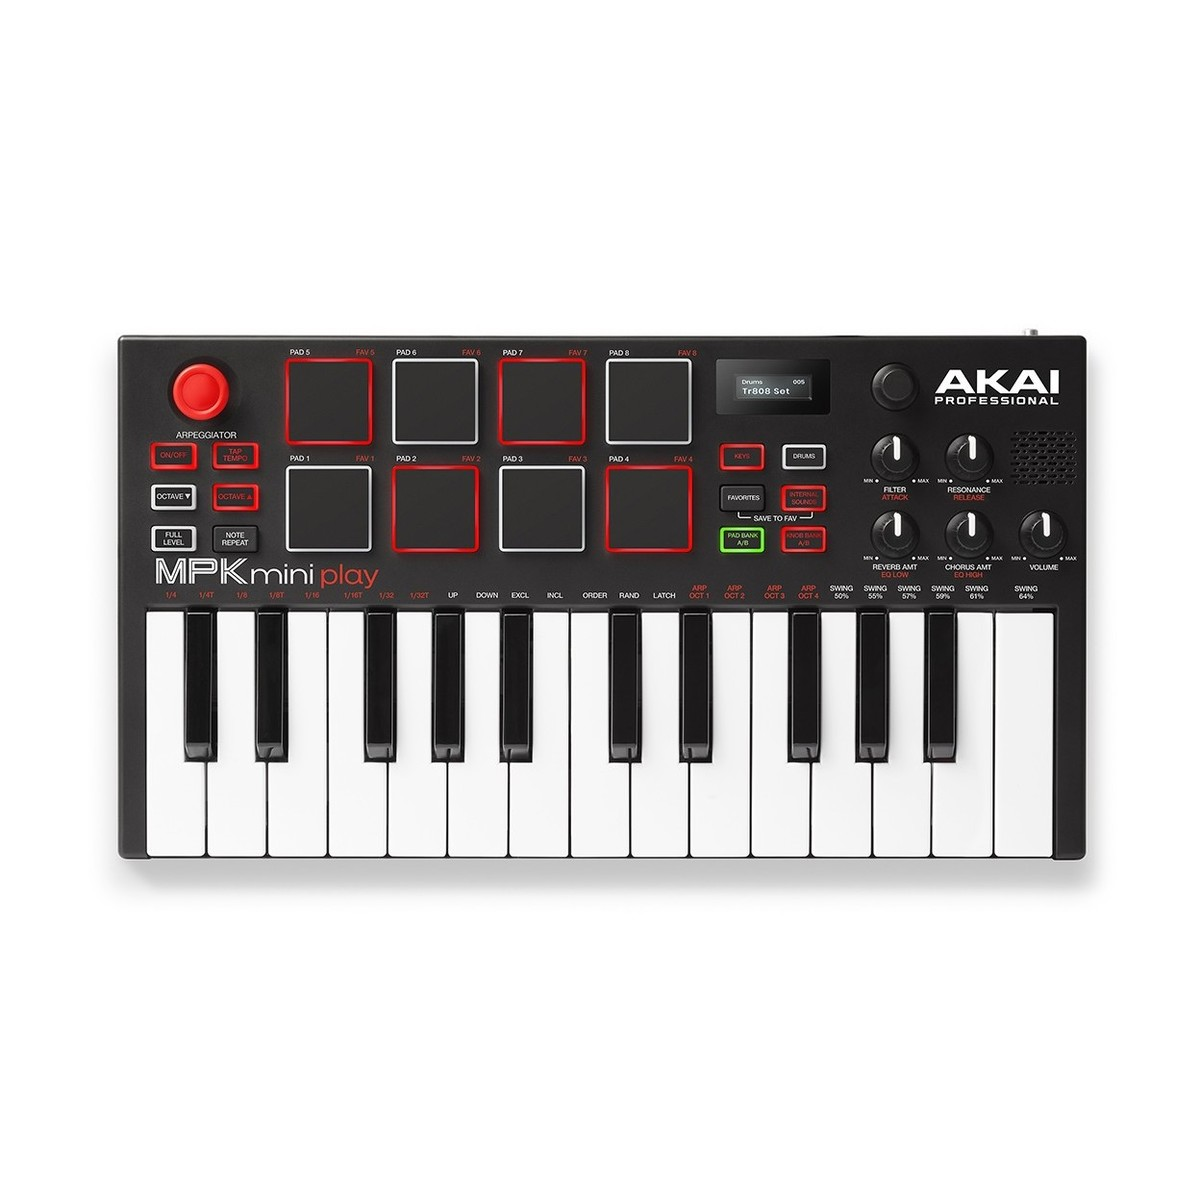 akai mpk mini play standalone keyboard and midi controller at gear4music. Black Bedroom Furniture Sets. Home Design Ideas